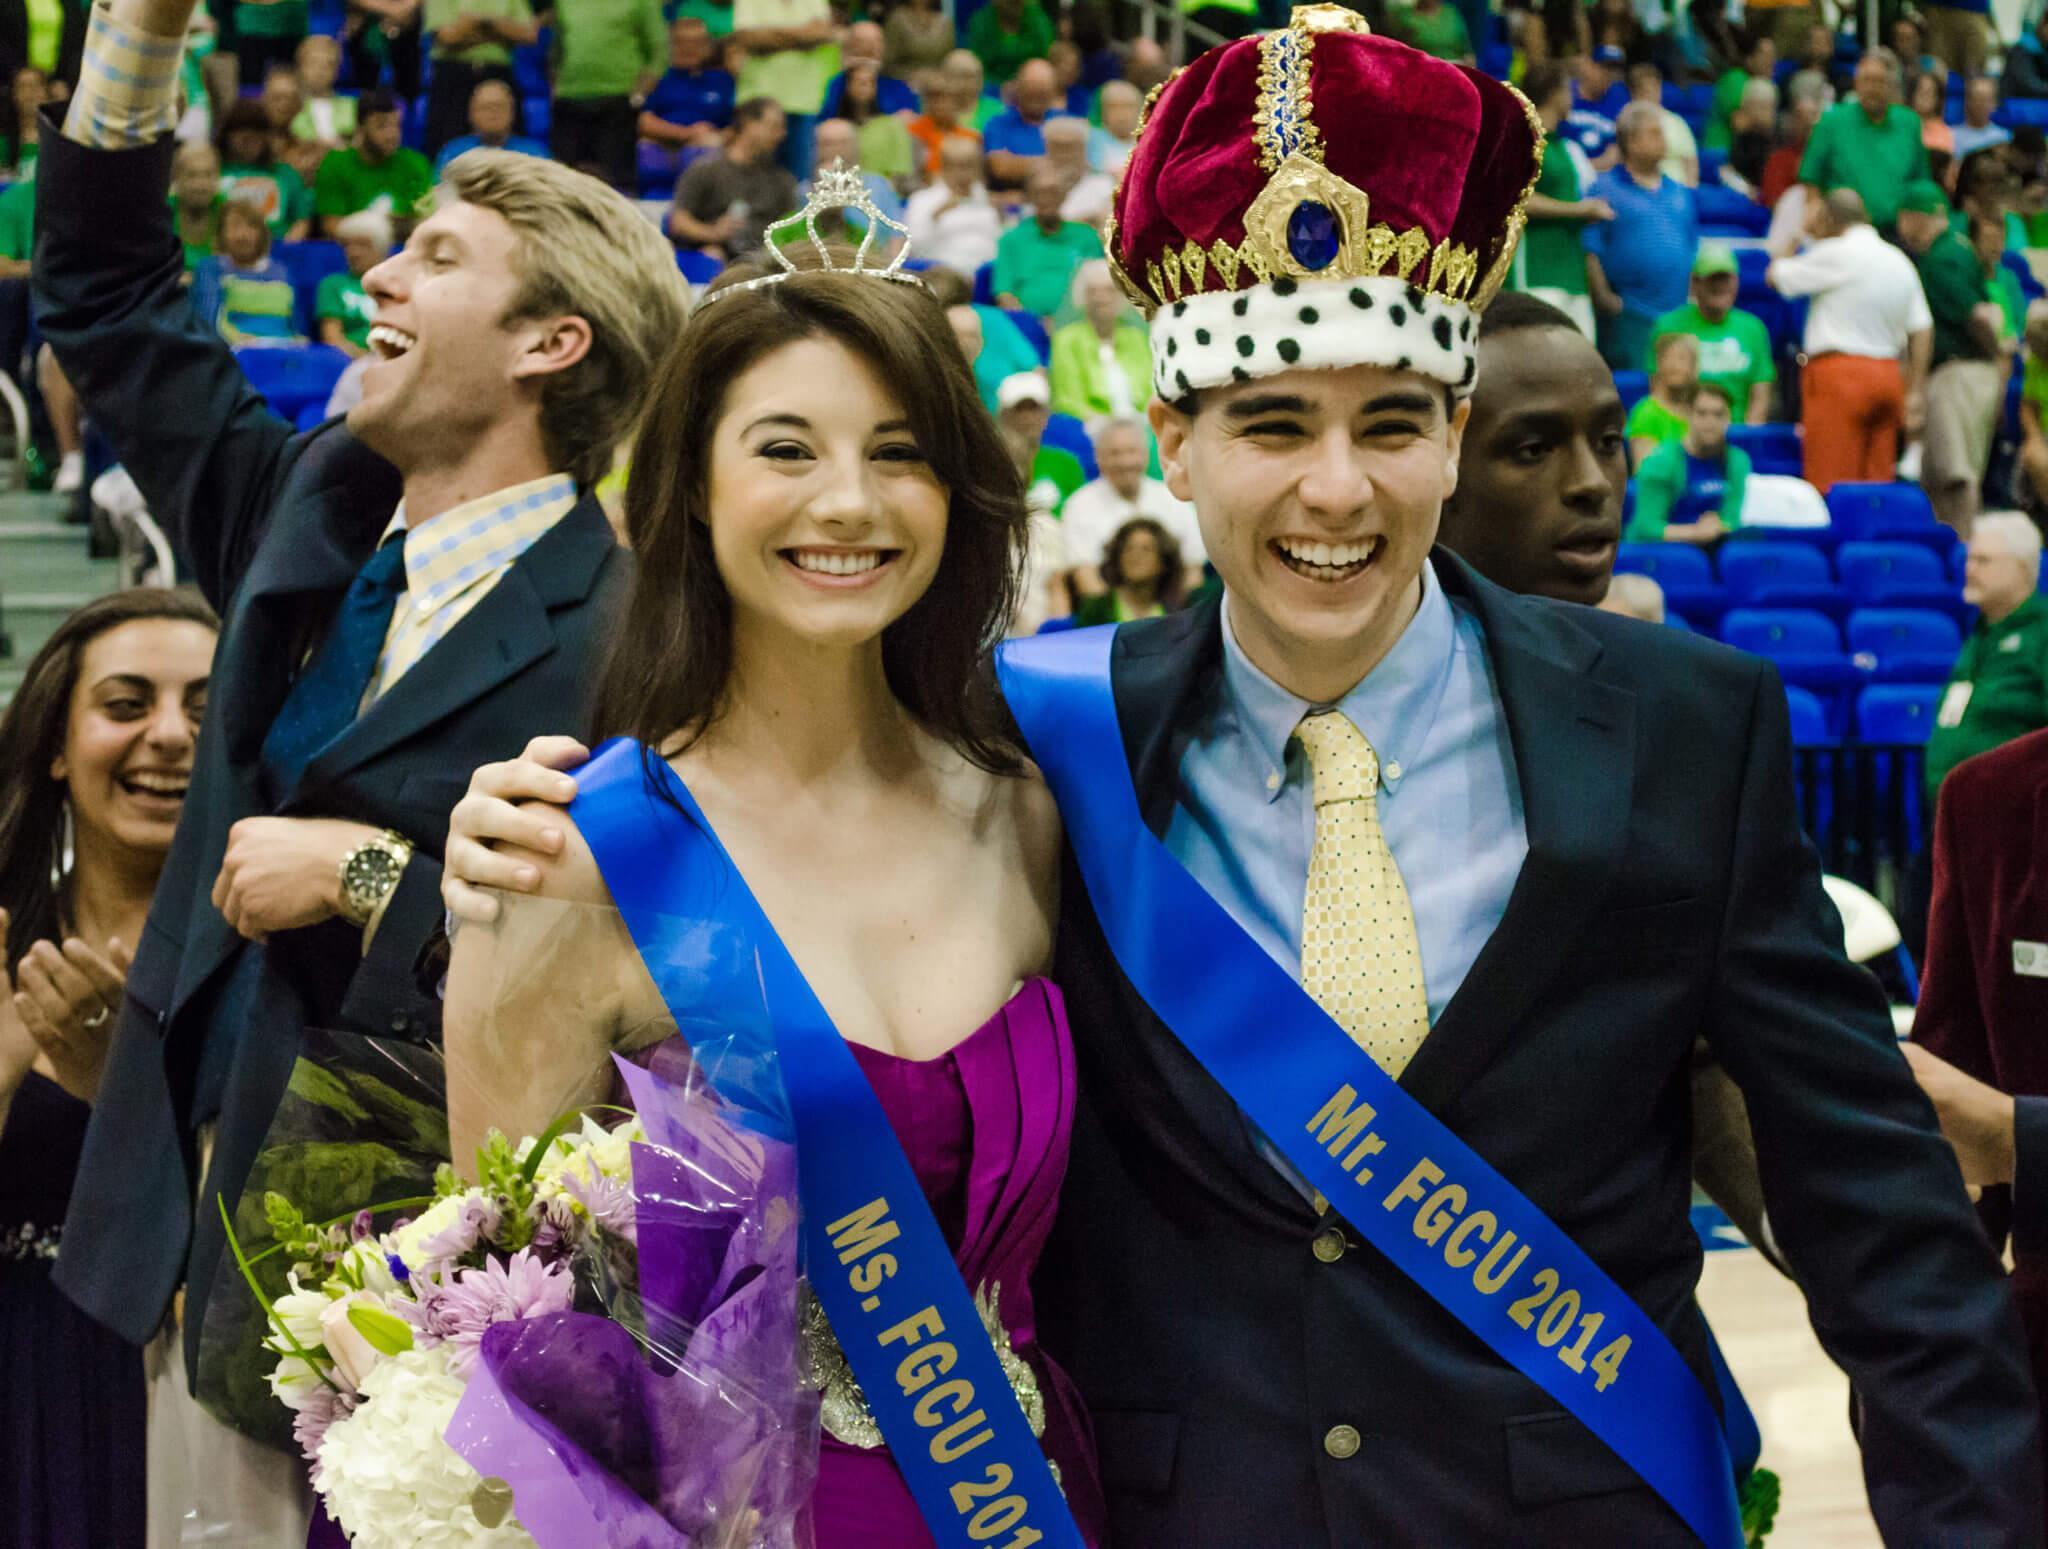 Michael Denkler, Riley Nowell named FGCU pageant winners